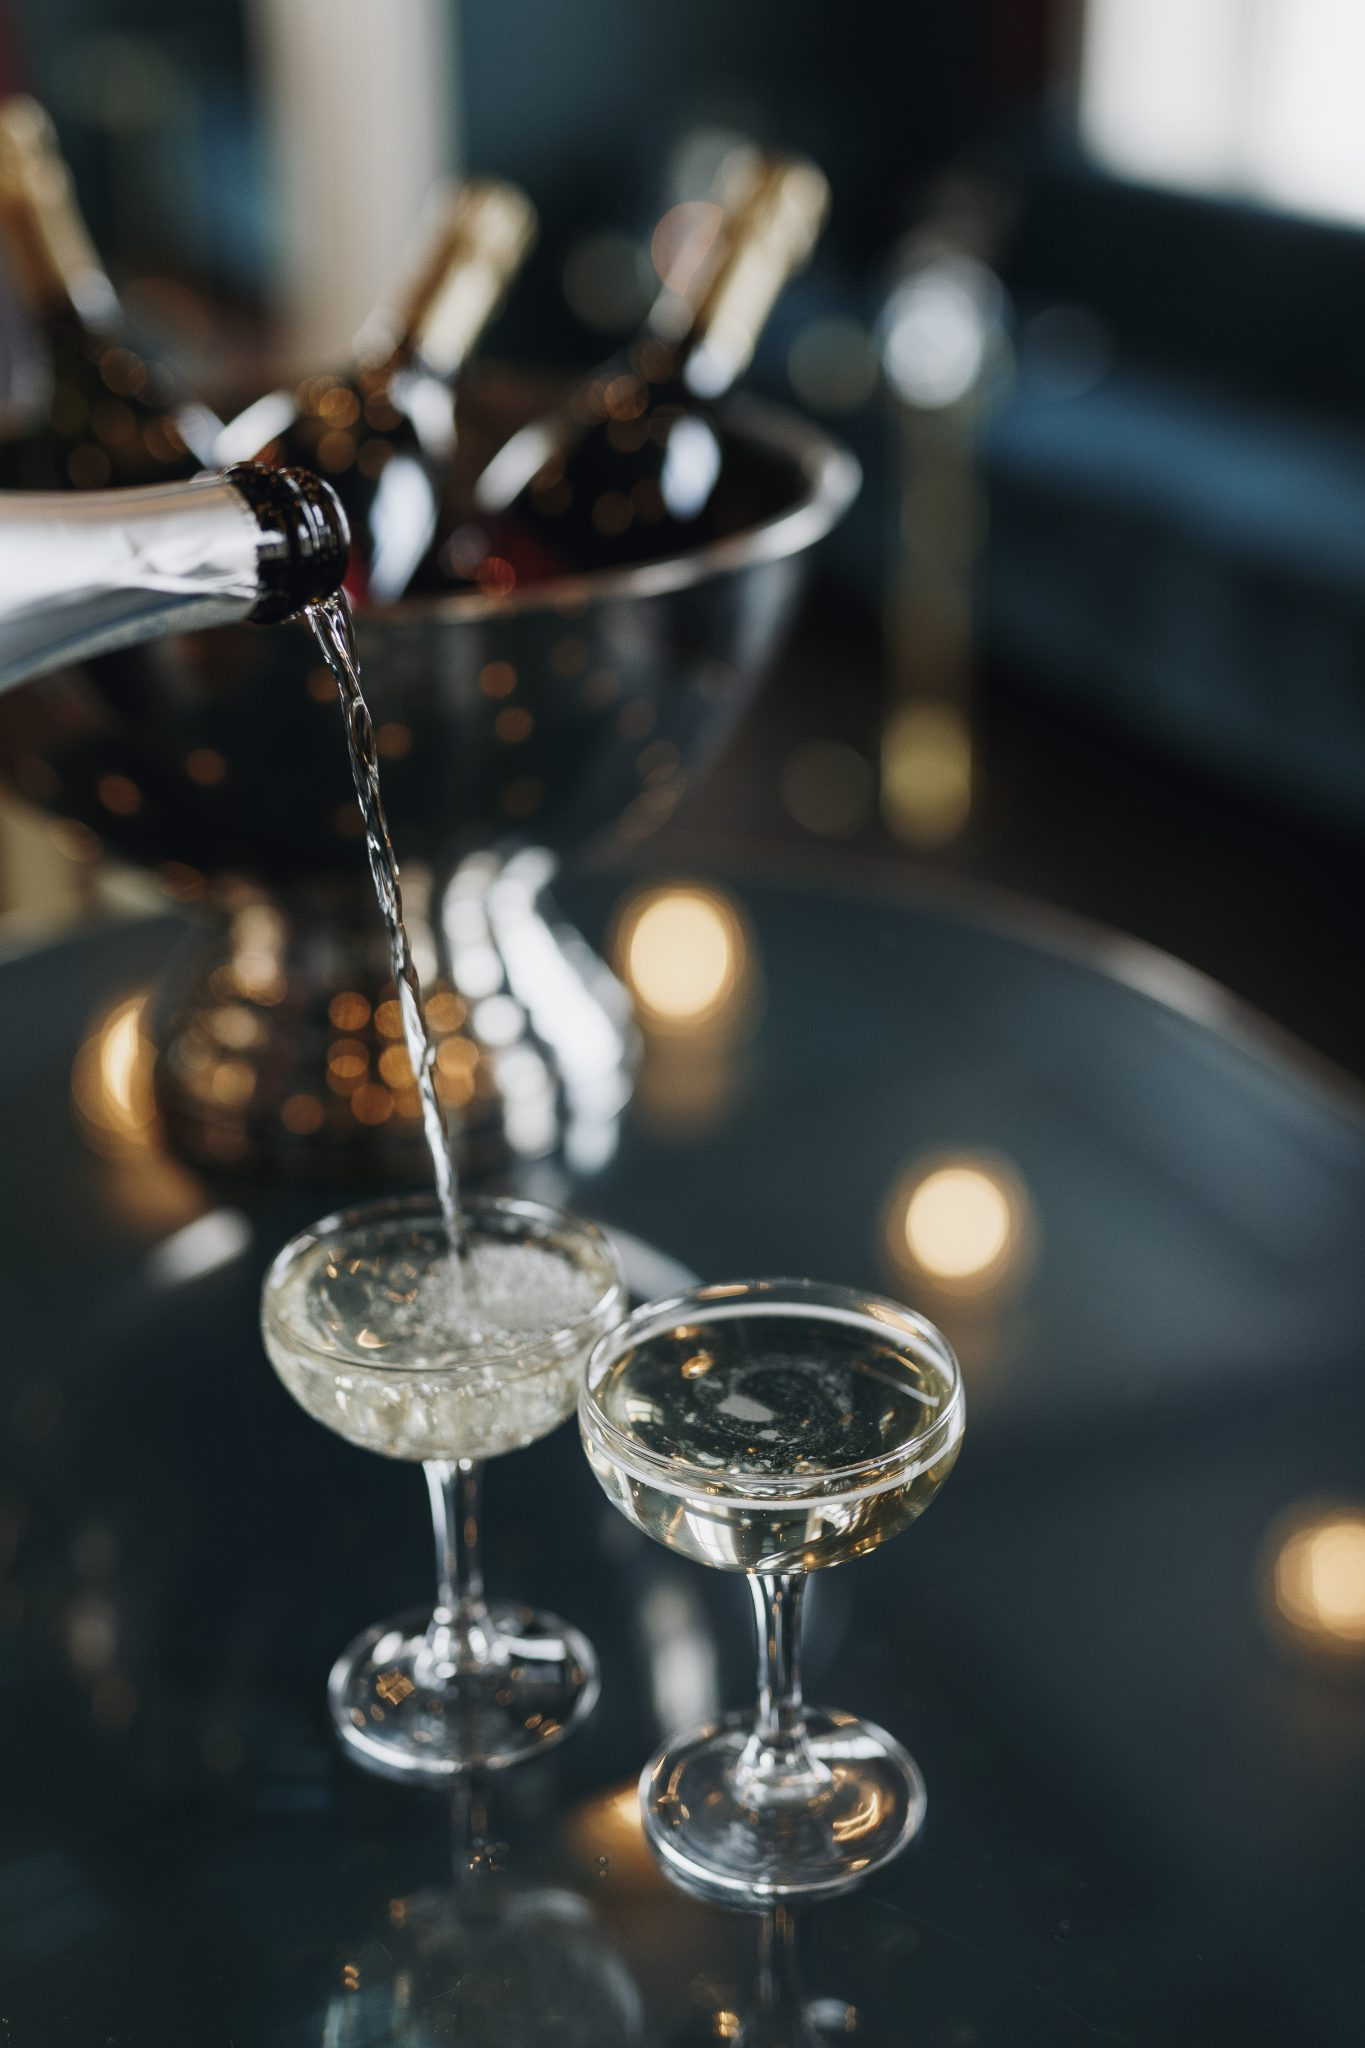 södra teatern champagne